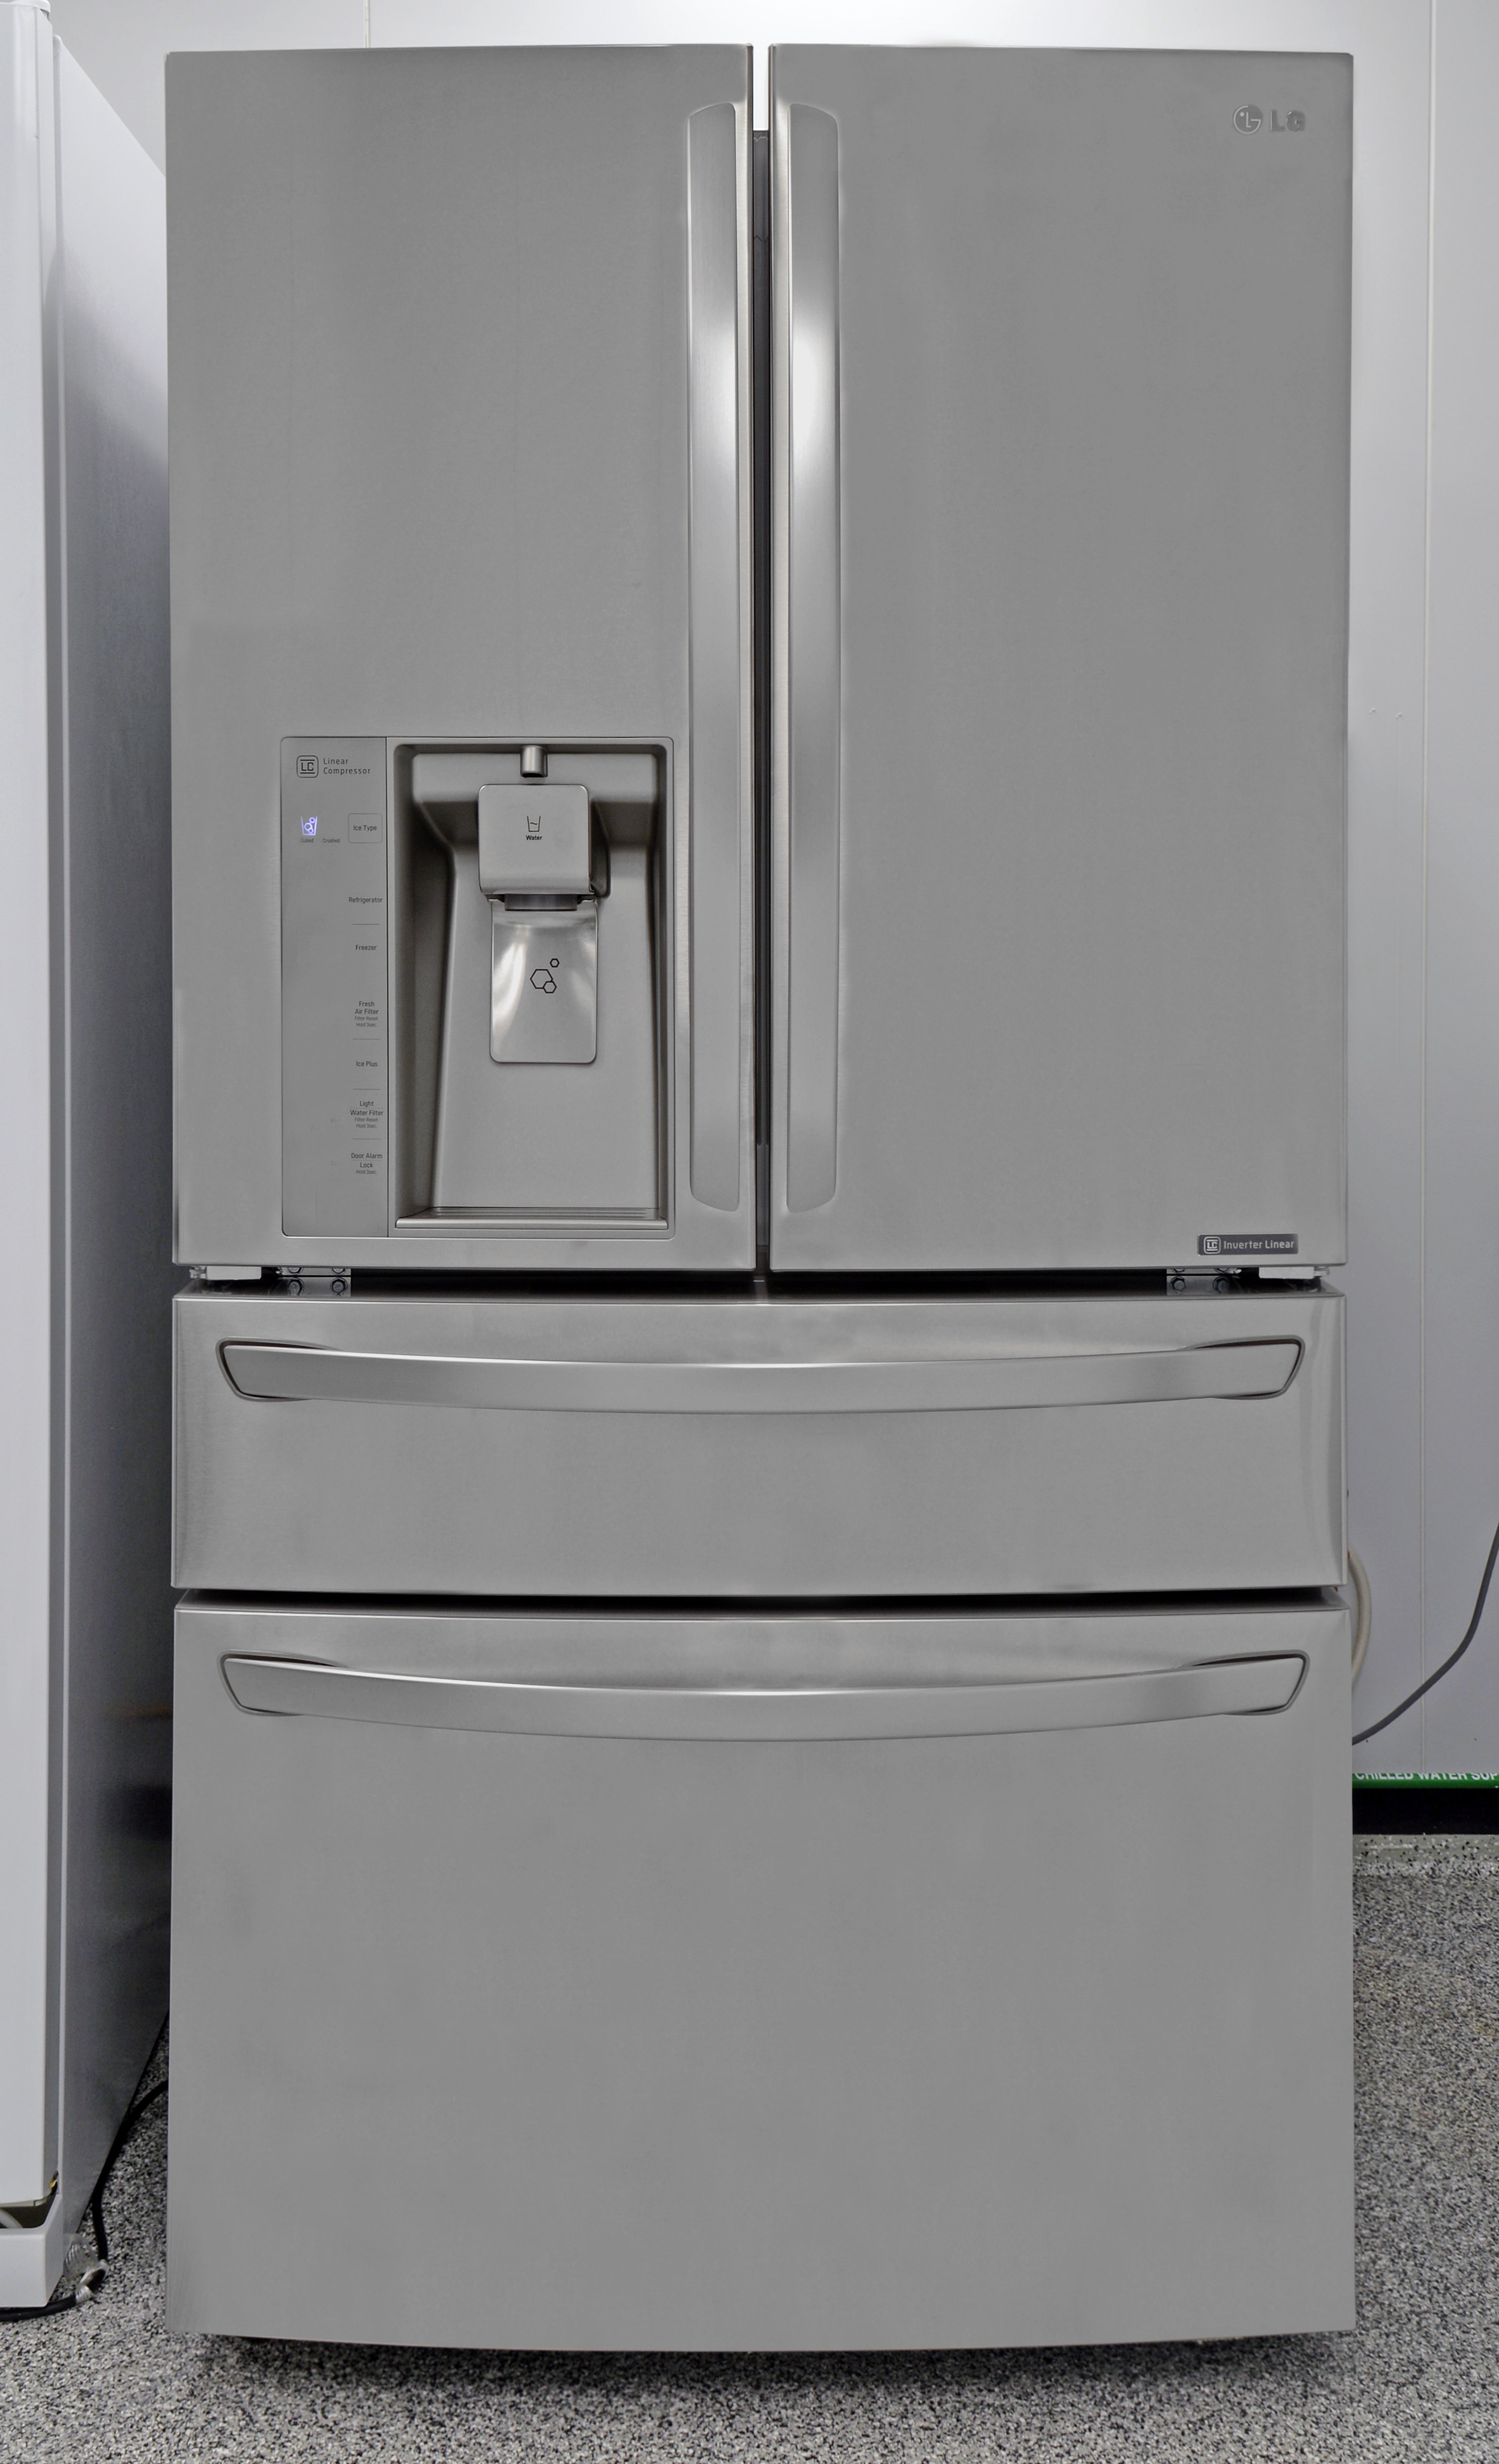 The massive LG LMXS30786S four door fridge is an impressive sight.